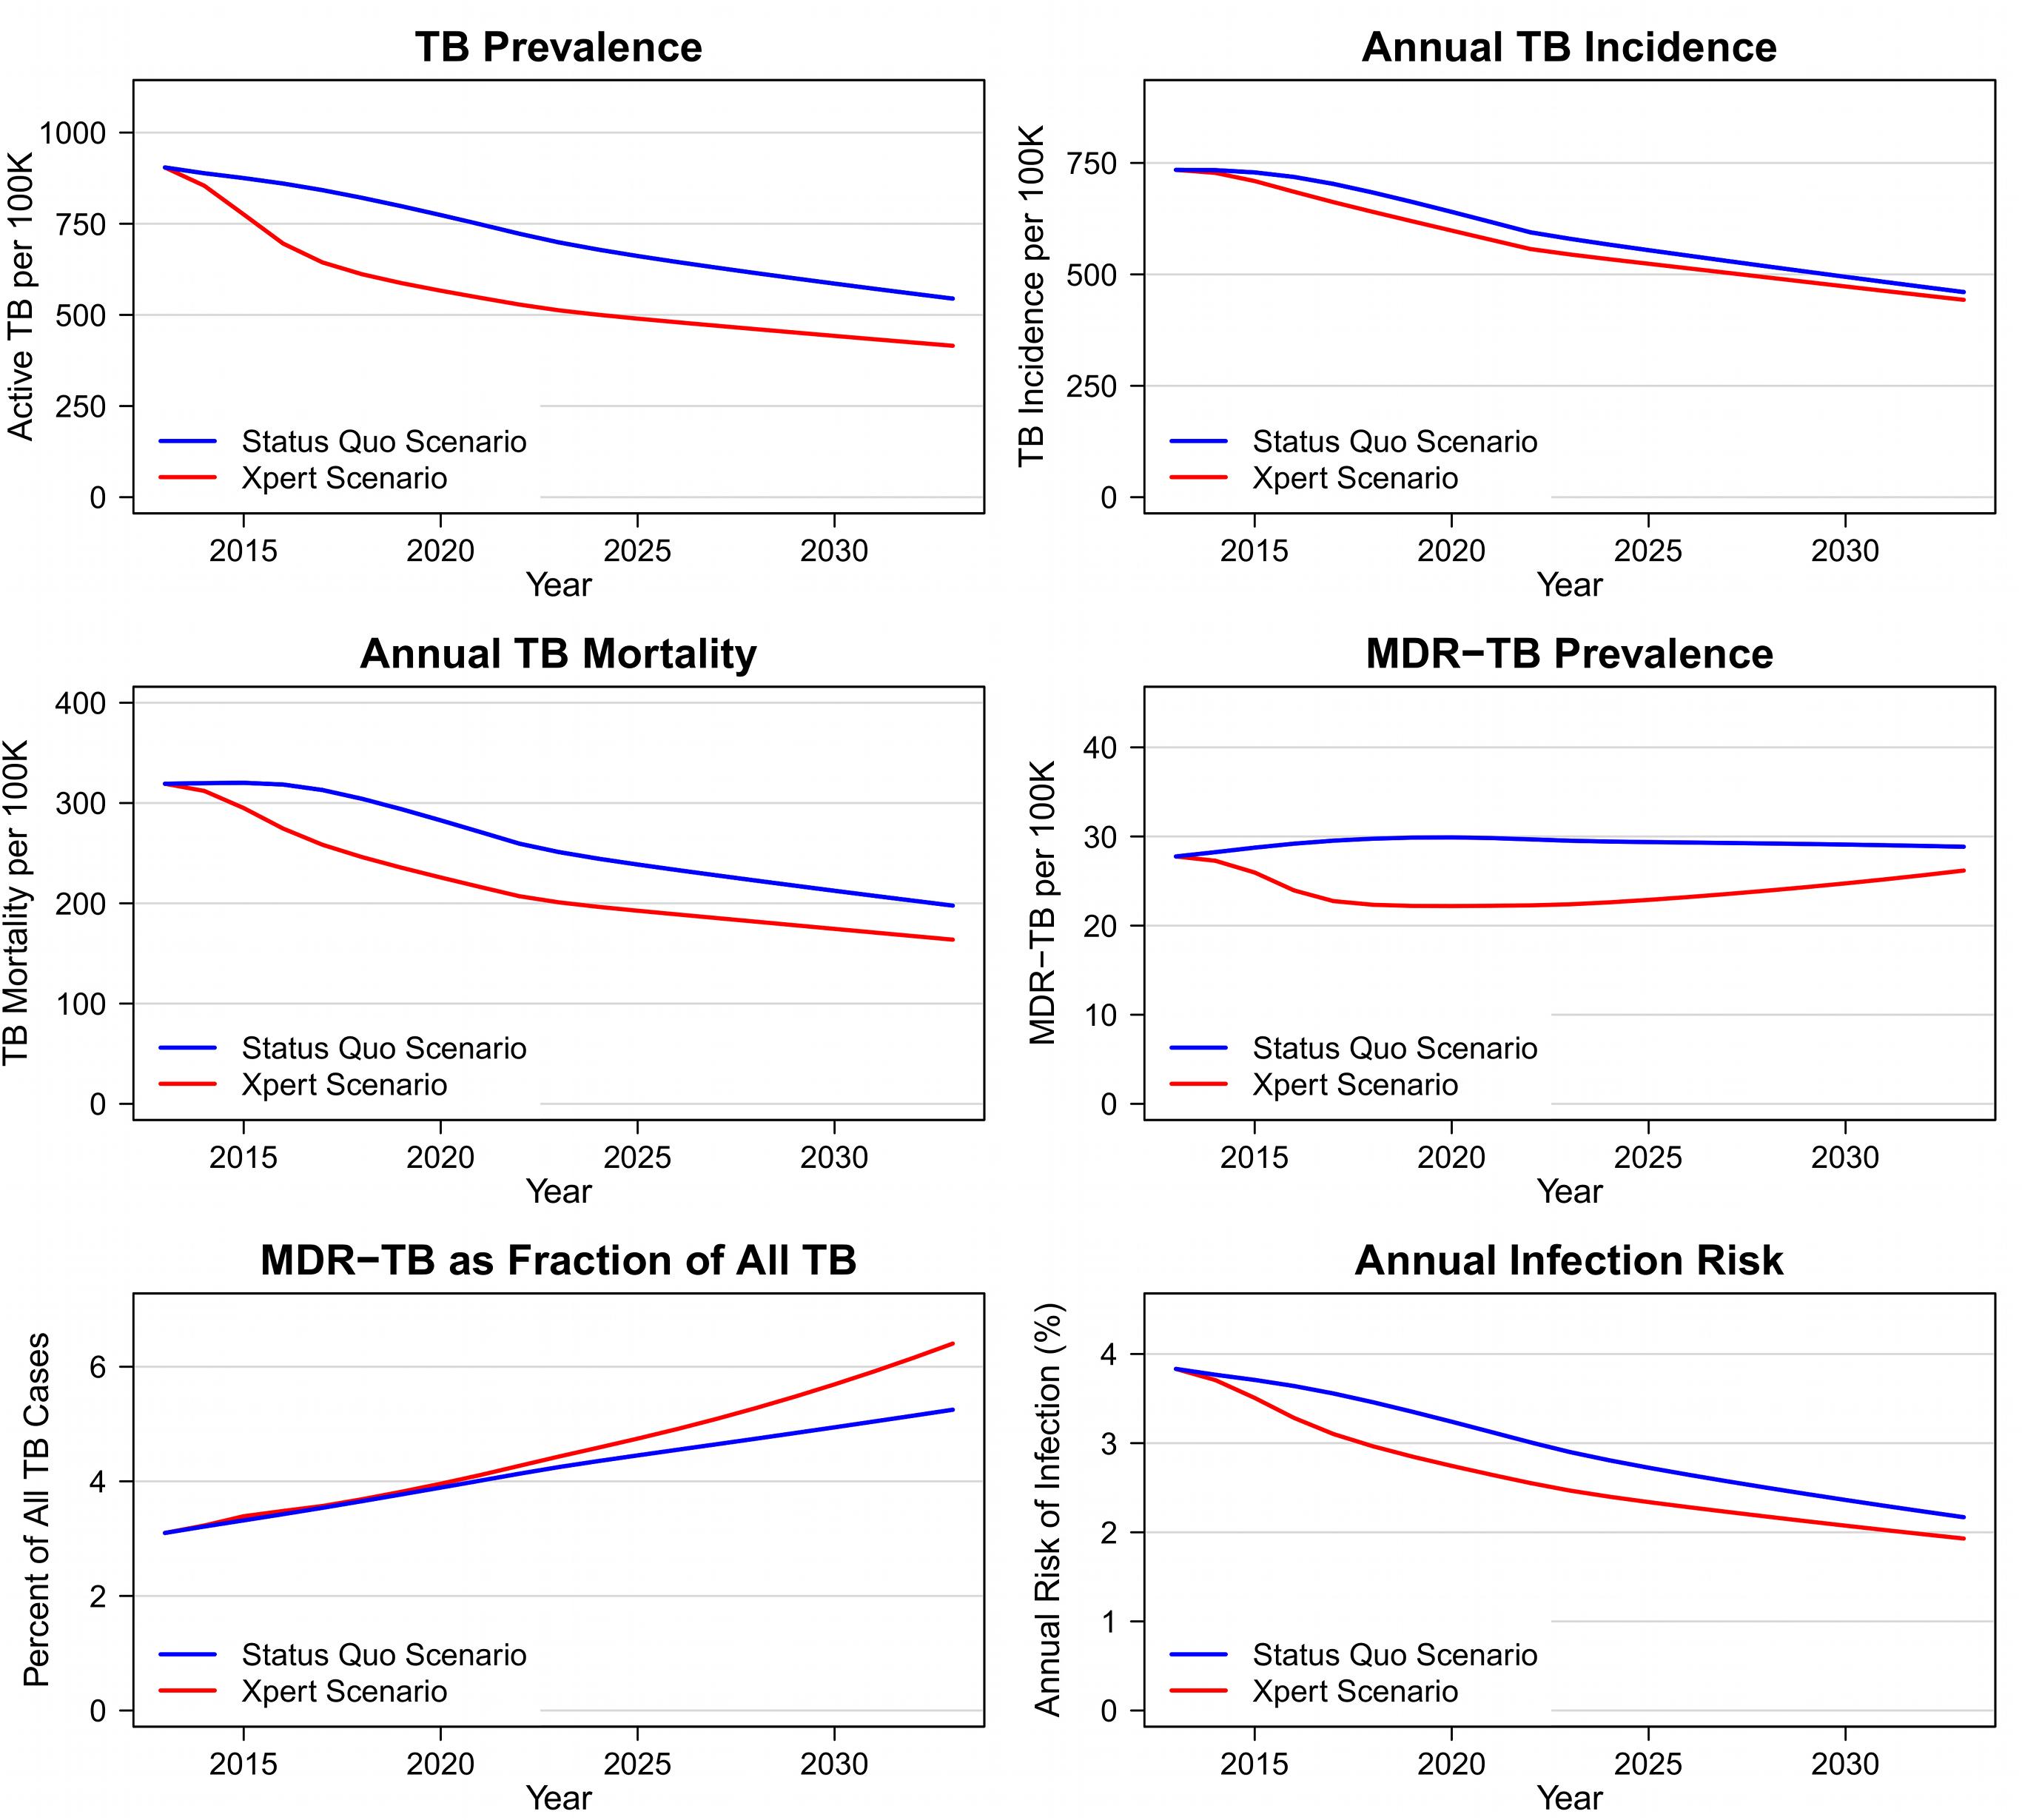 Epidemiologic outcomes in Xpert and status quo scenarios, 2012–2032.